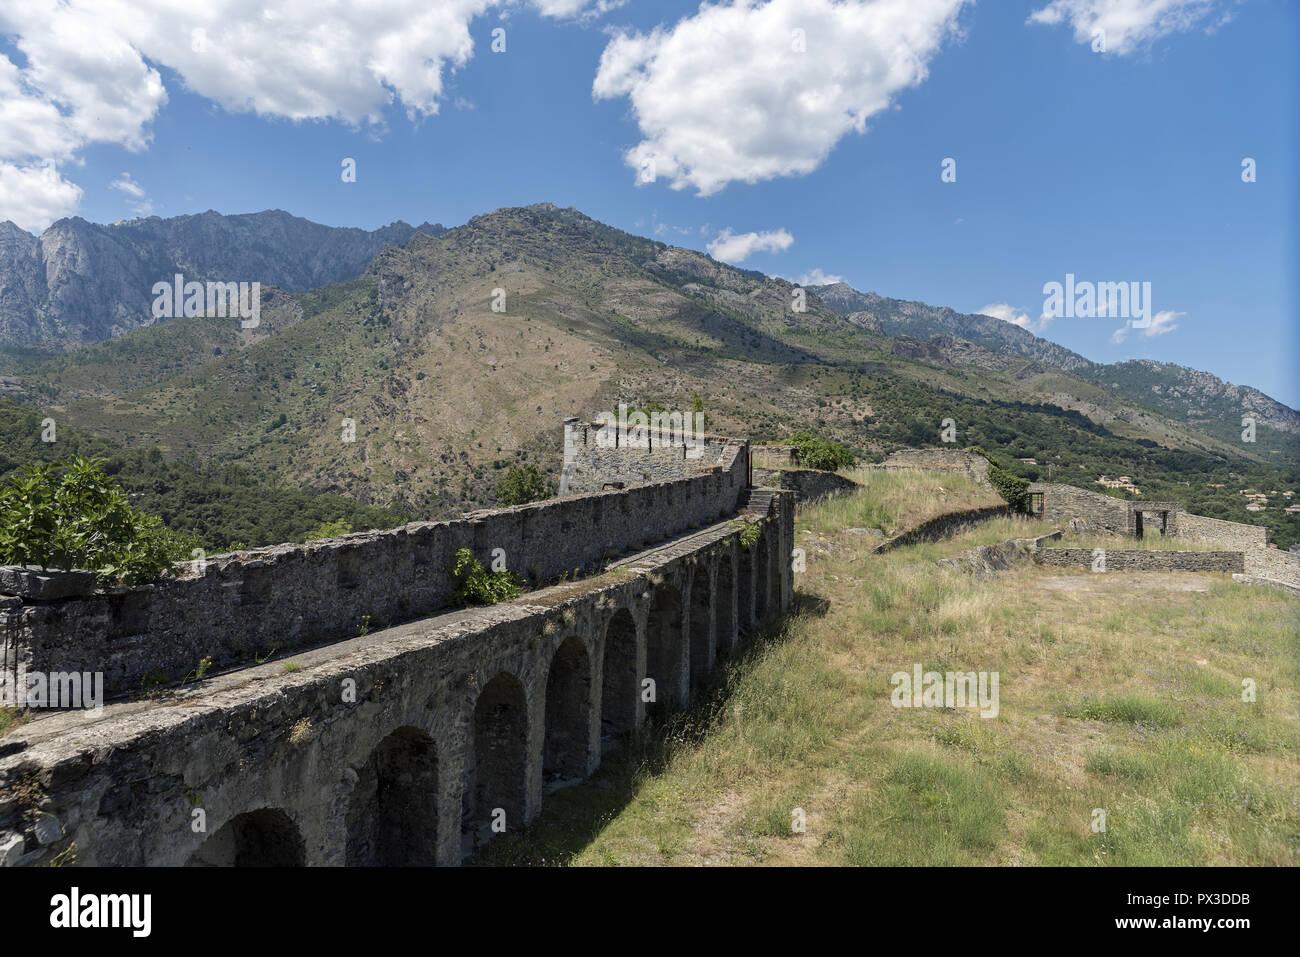 Mountains around the city of Corte. Defensive wall. Mur obronny. Góry w okolicy miasta Corte. - Stock Image